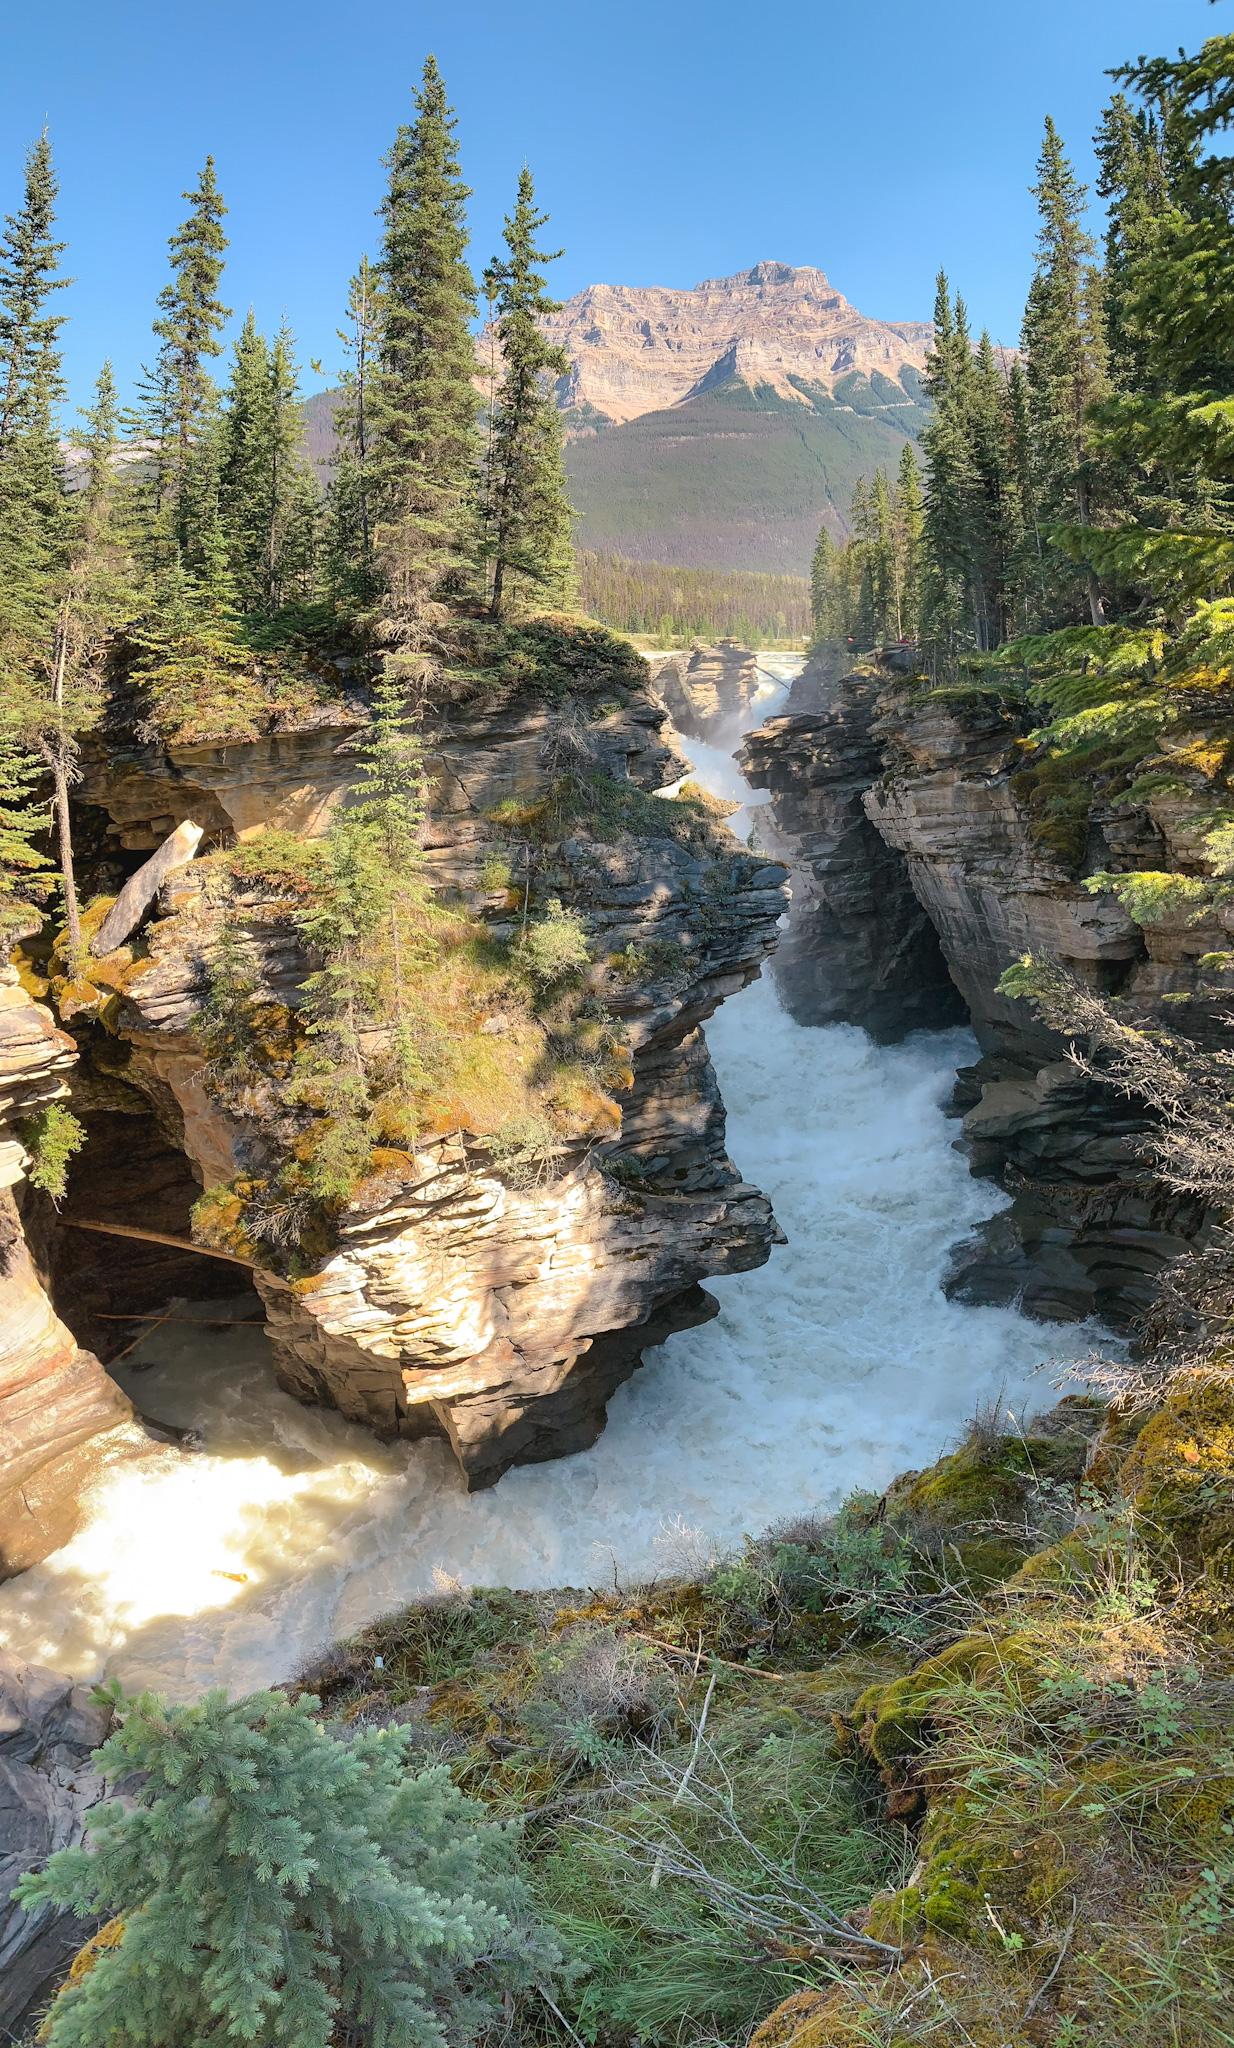 Athabasca Falls in Jasper National Park, Alberta